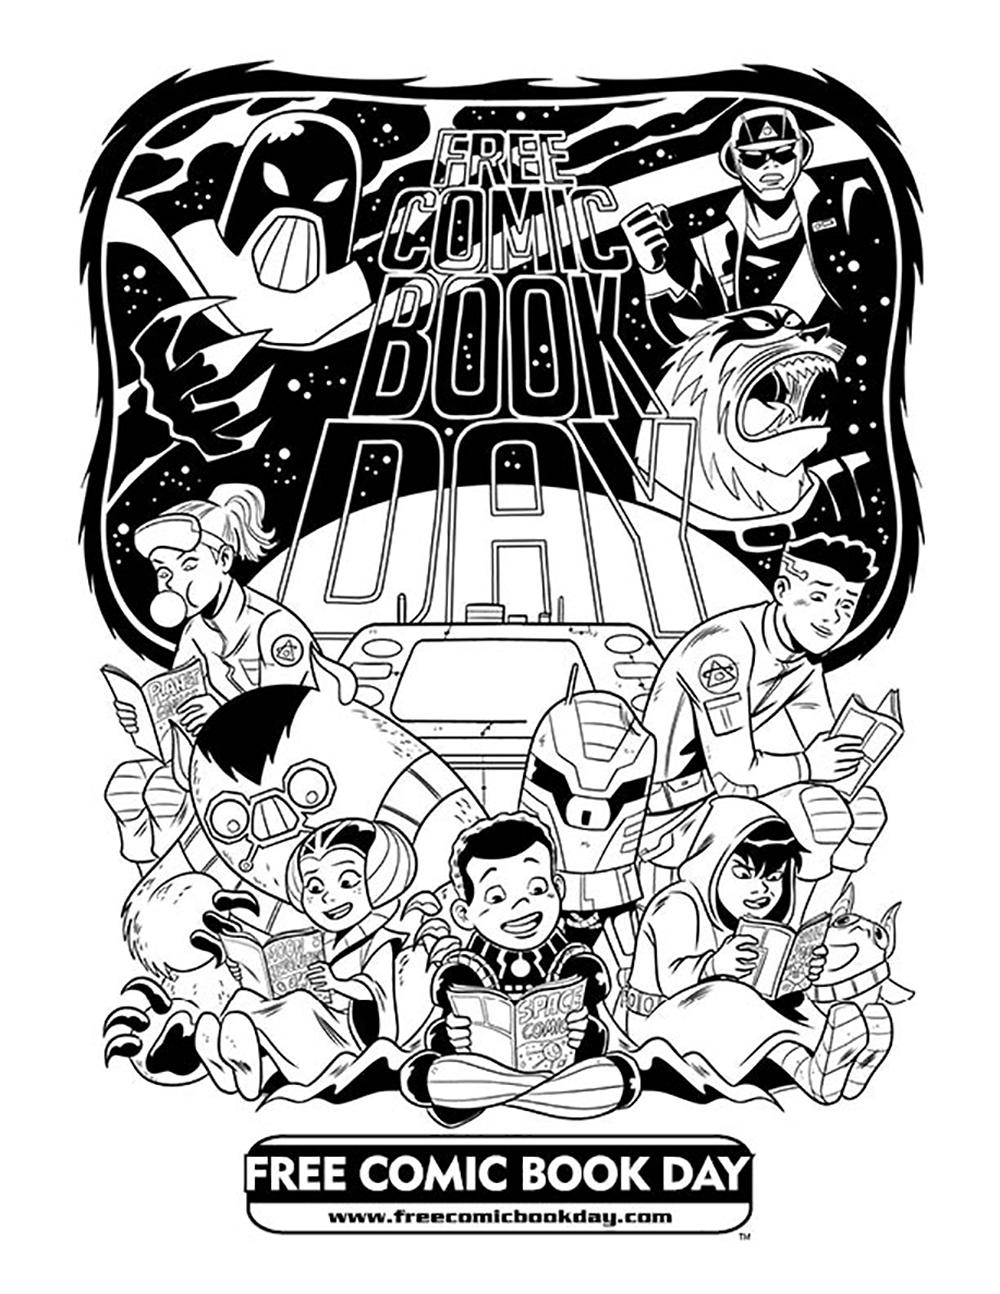 FCBD 2019 Site Downloads - Free Comic Book Day